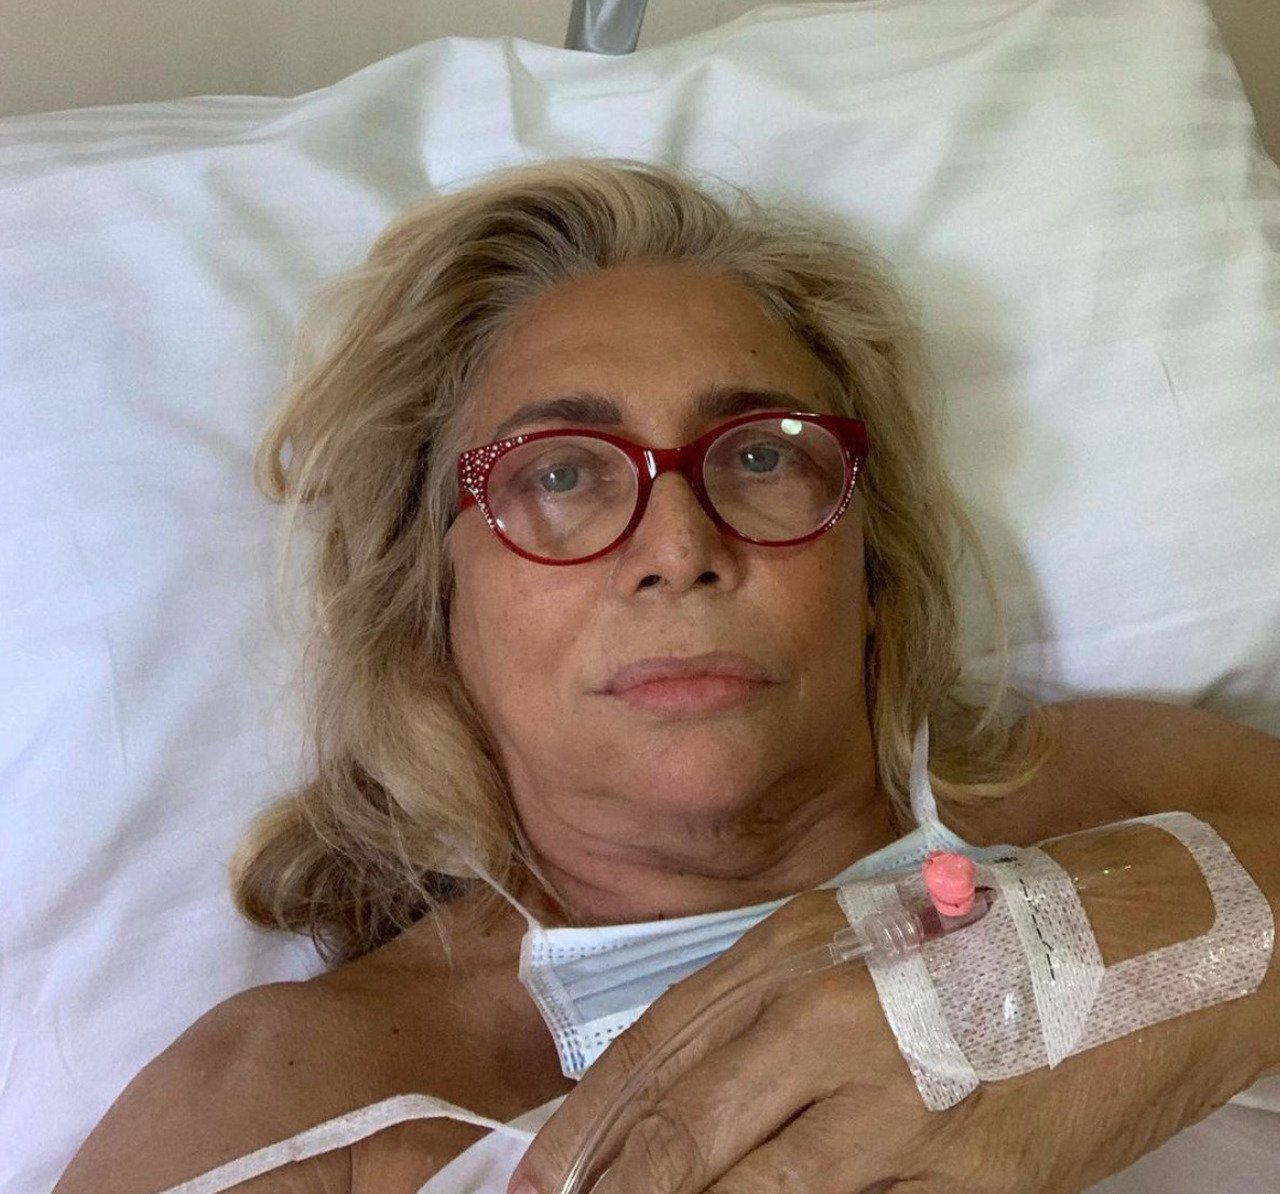 Mara Venier Operazione Denti Condizioni Salute